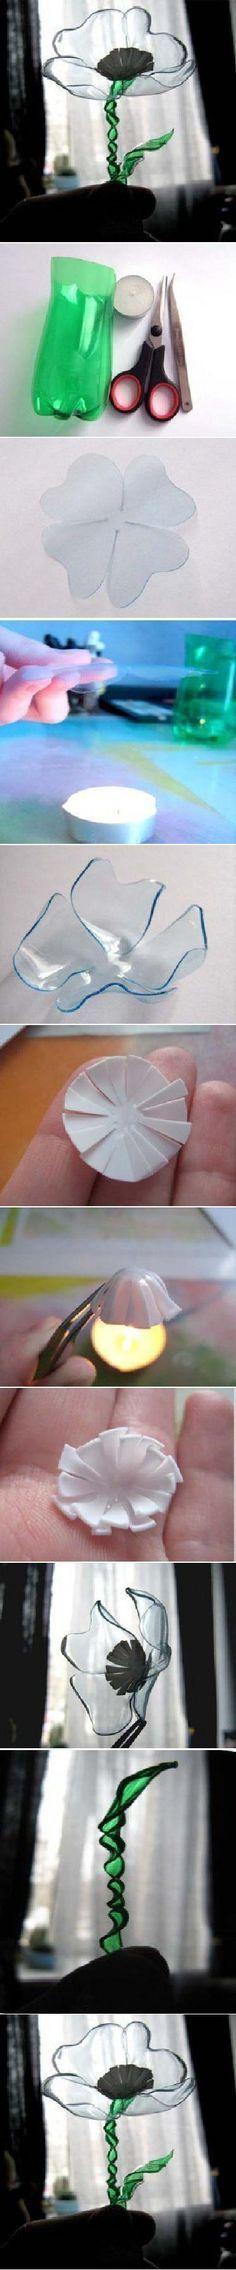 diy, diy projects, diy craft, handmade, diy ideas, diy flower from a plastic bottle - Folkvox - Imágenes que hablan de mí -